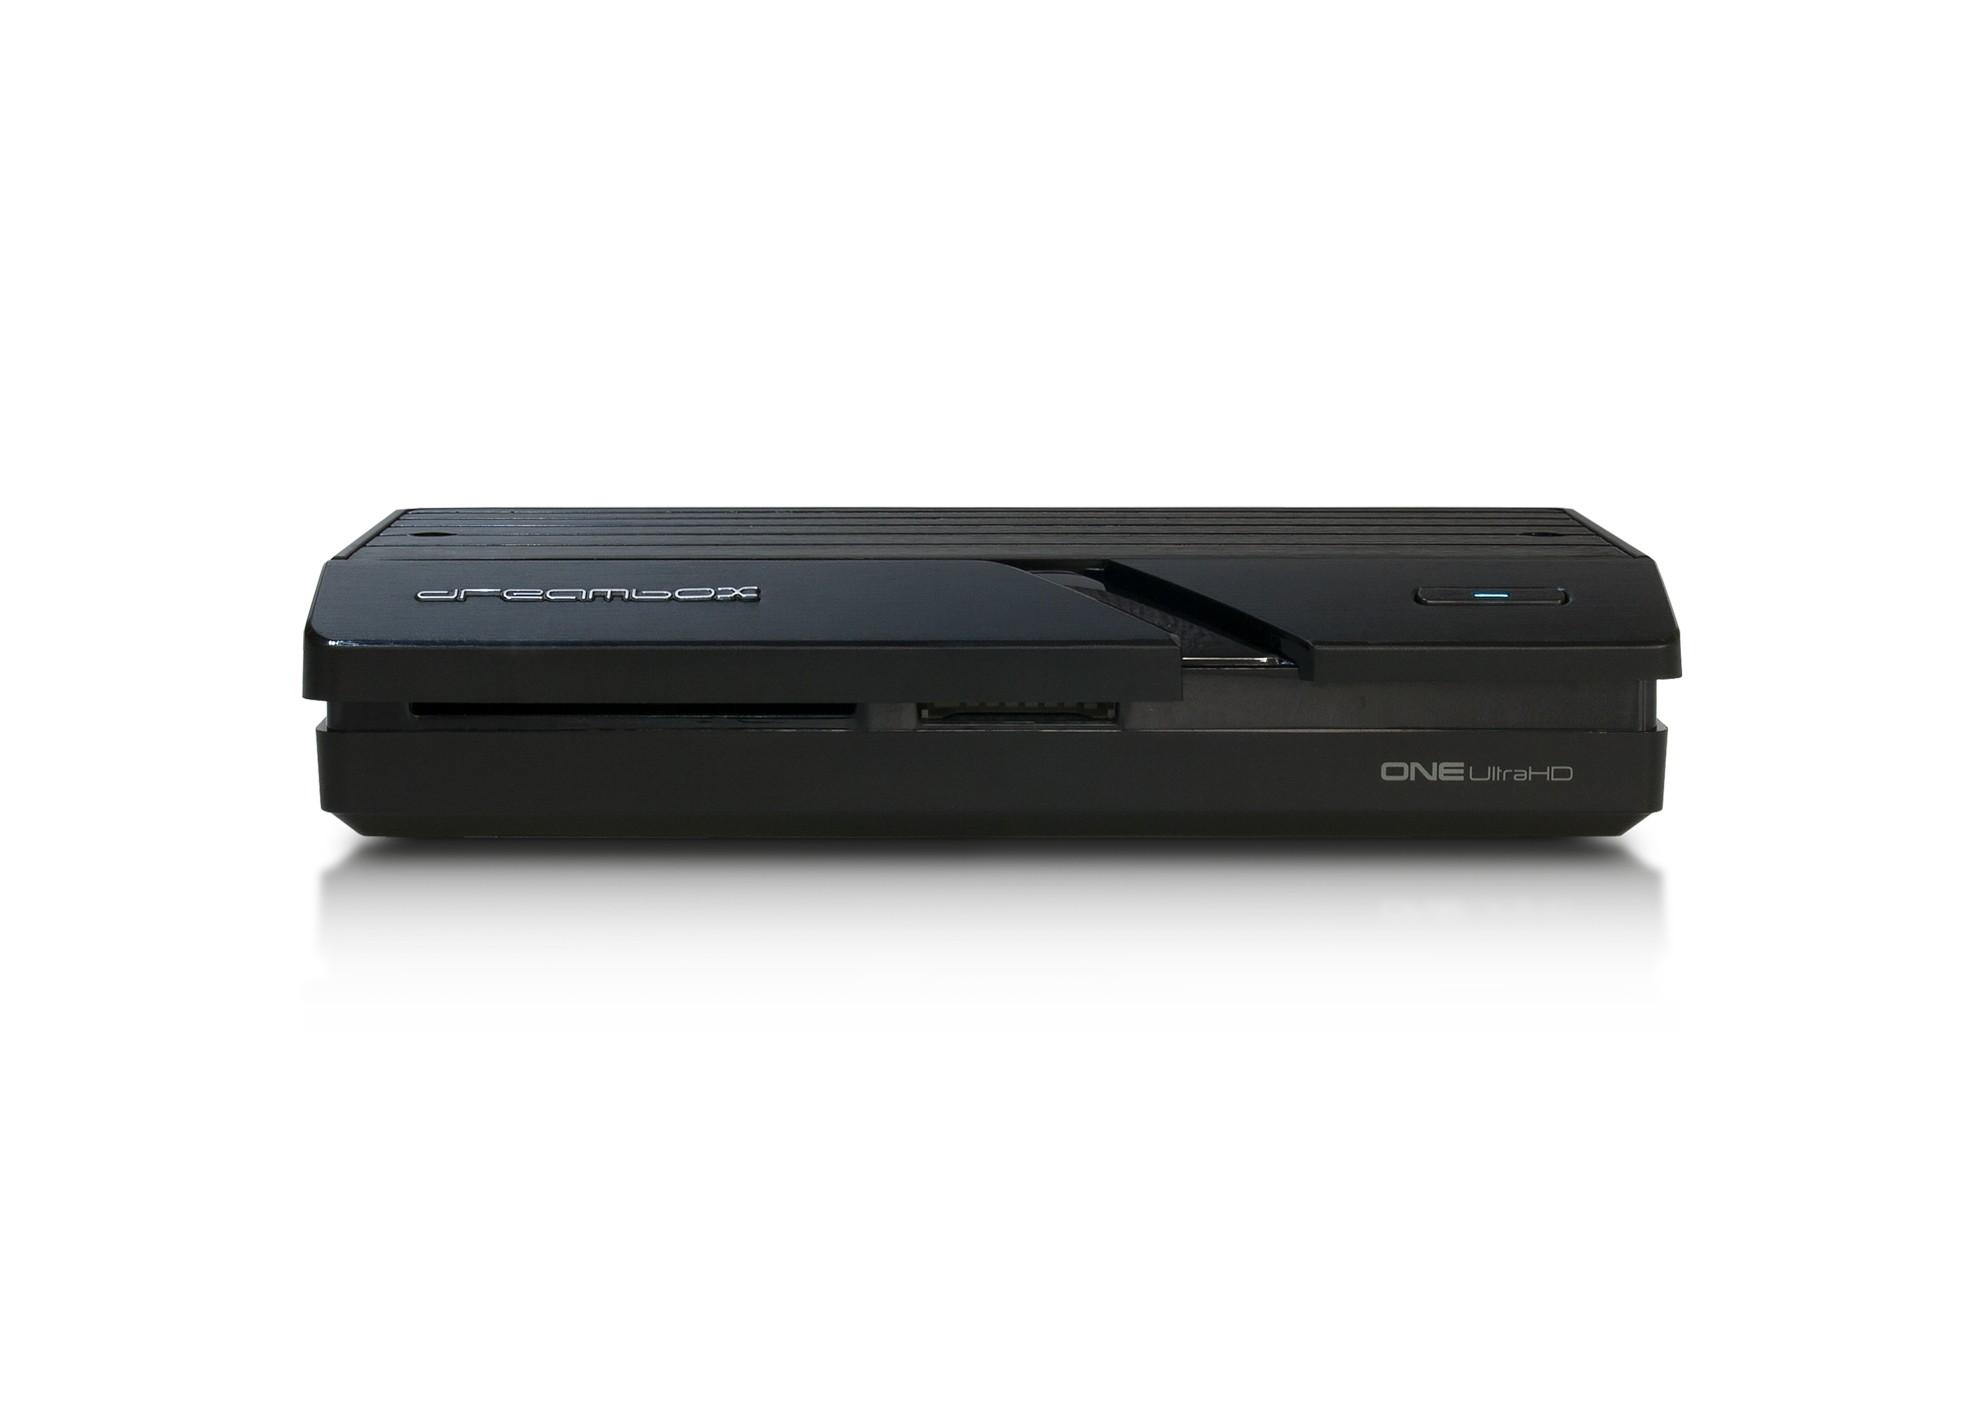 Dreambox ONE Combo UHD 4K (DVB-S2X, DVB-C/T2)